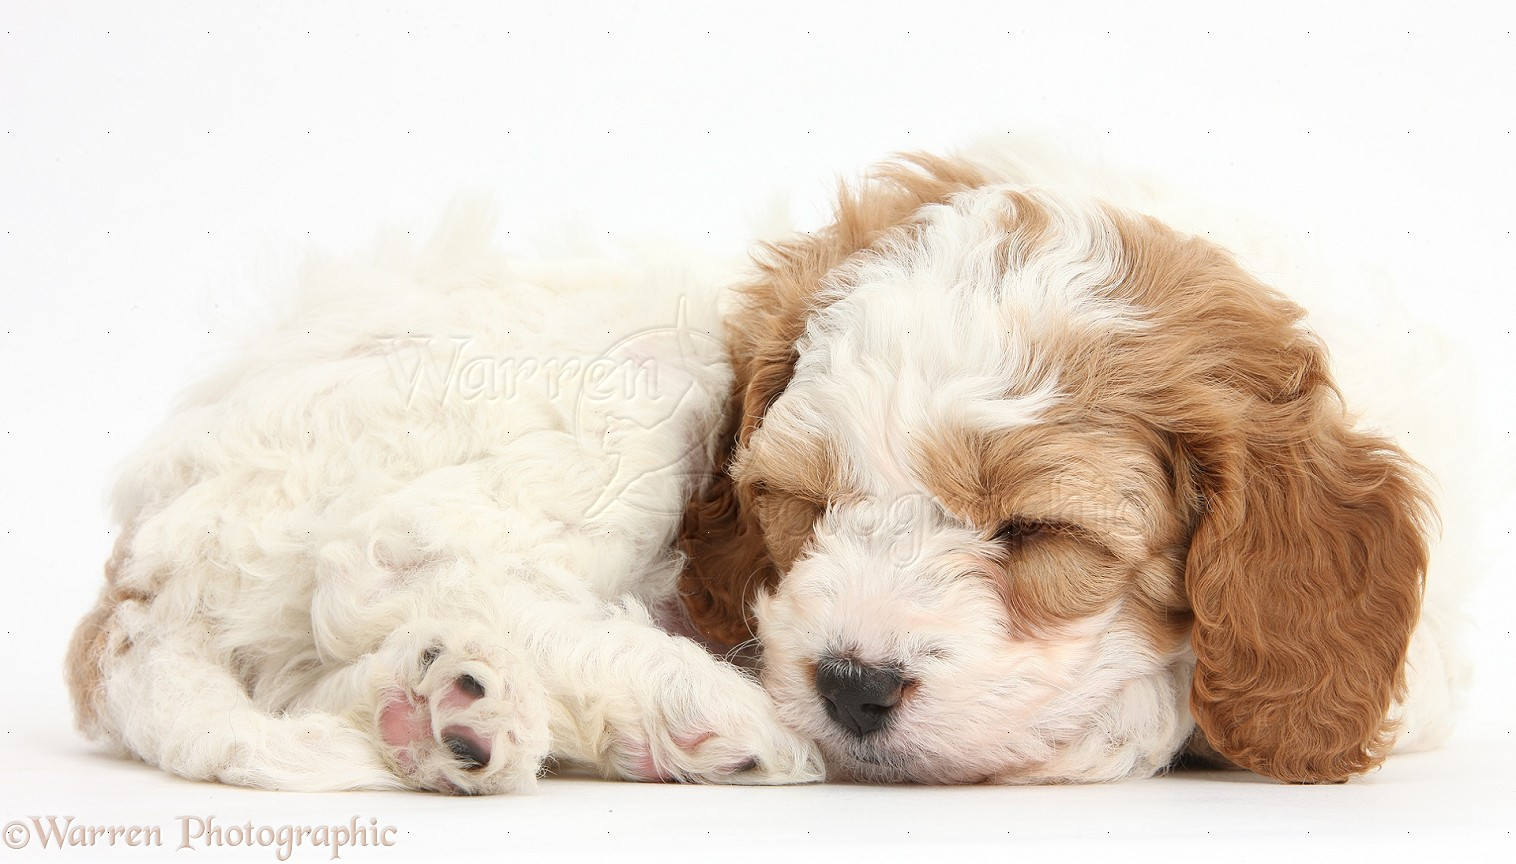 dog: cute sleeping cavapoo puppy photo wp39389